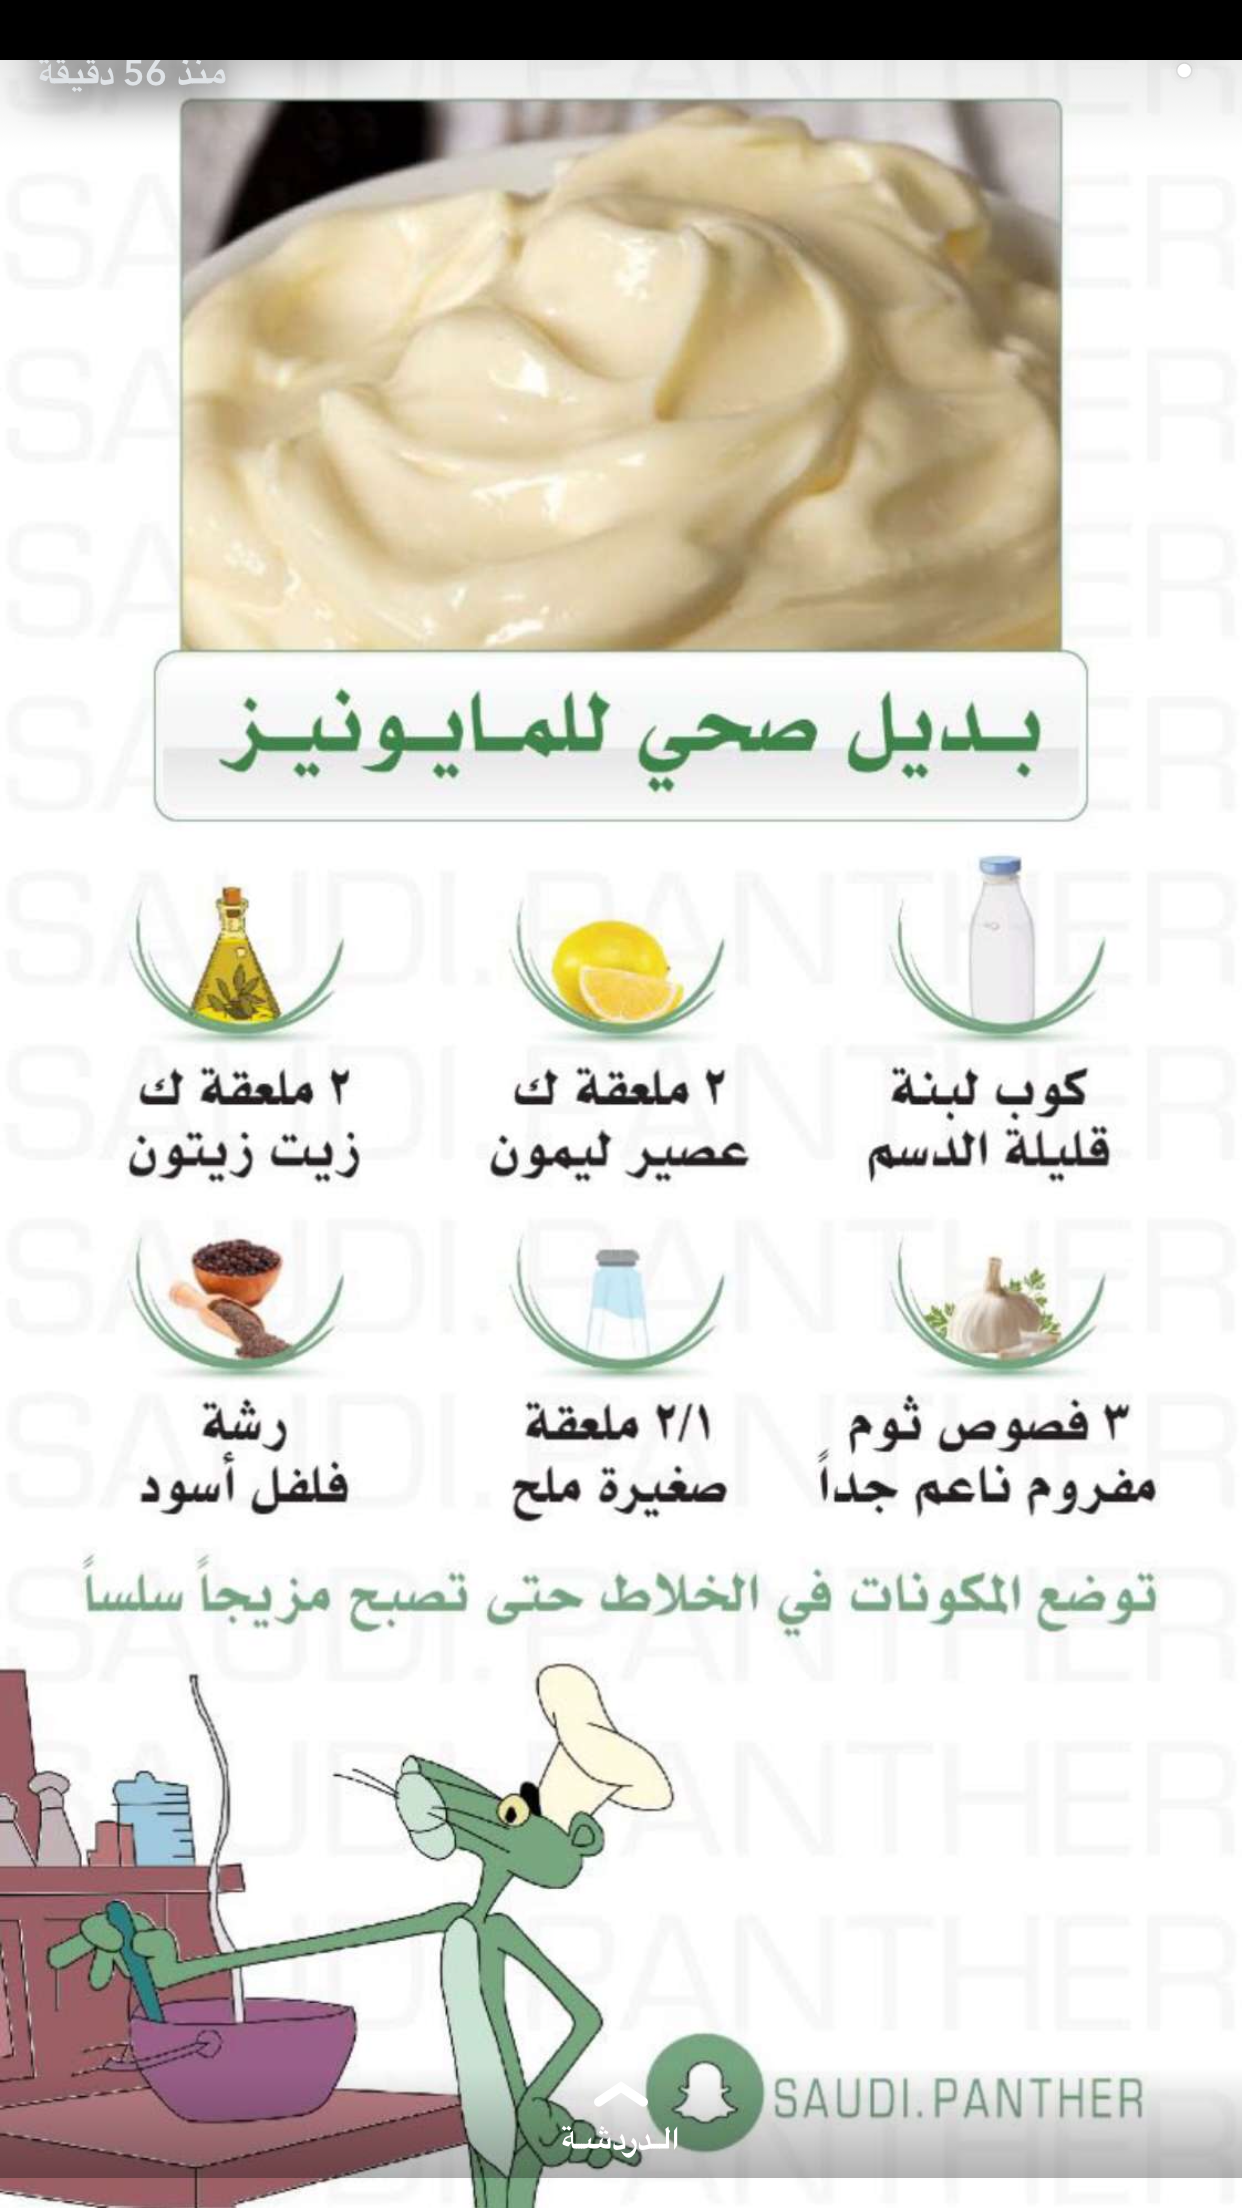 بديل المايونيز Food Receipes Save Food Food Recipies